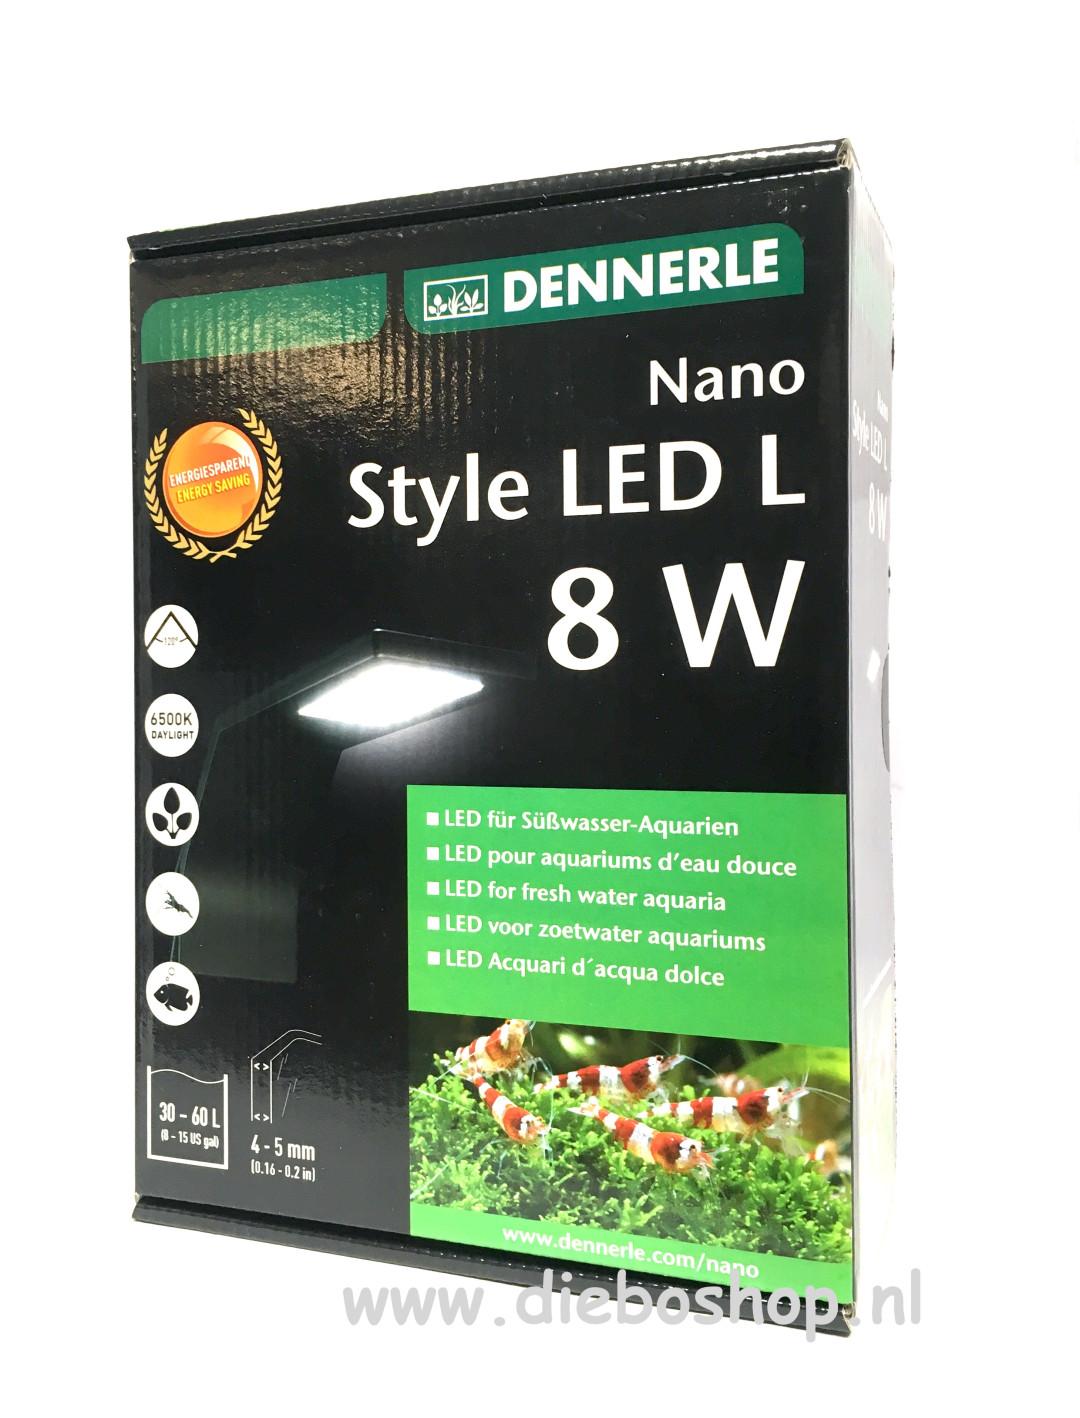 Dennerle Nano Style Led 8 W